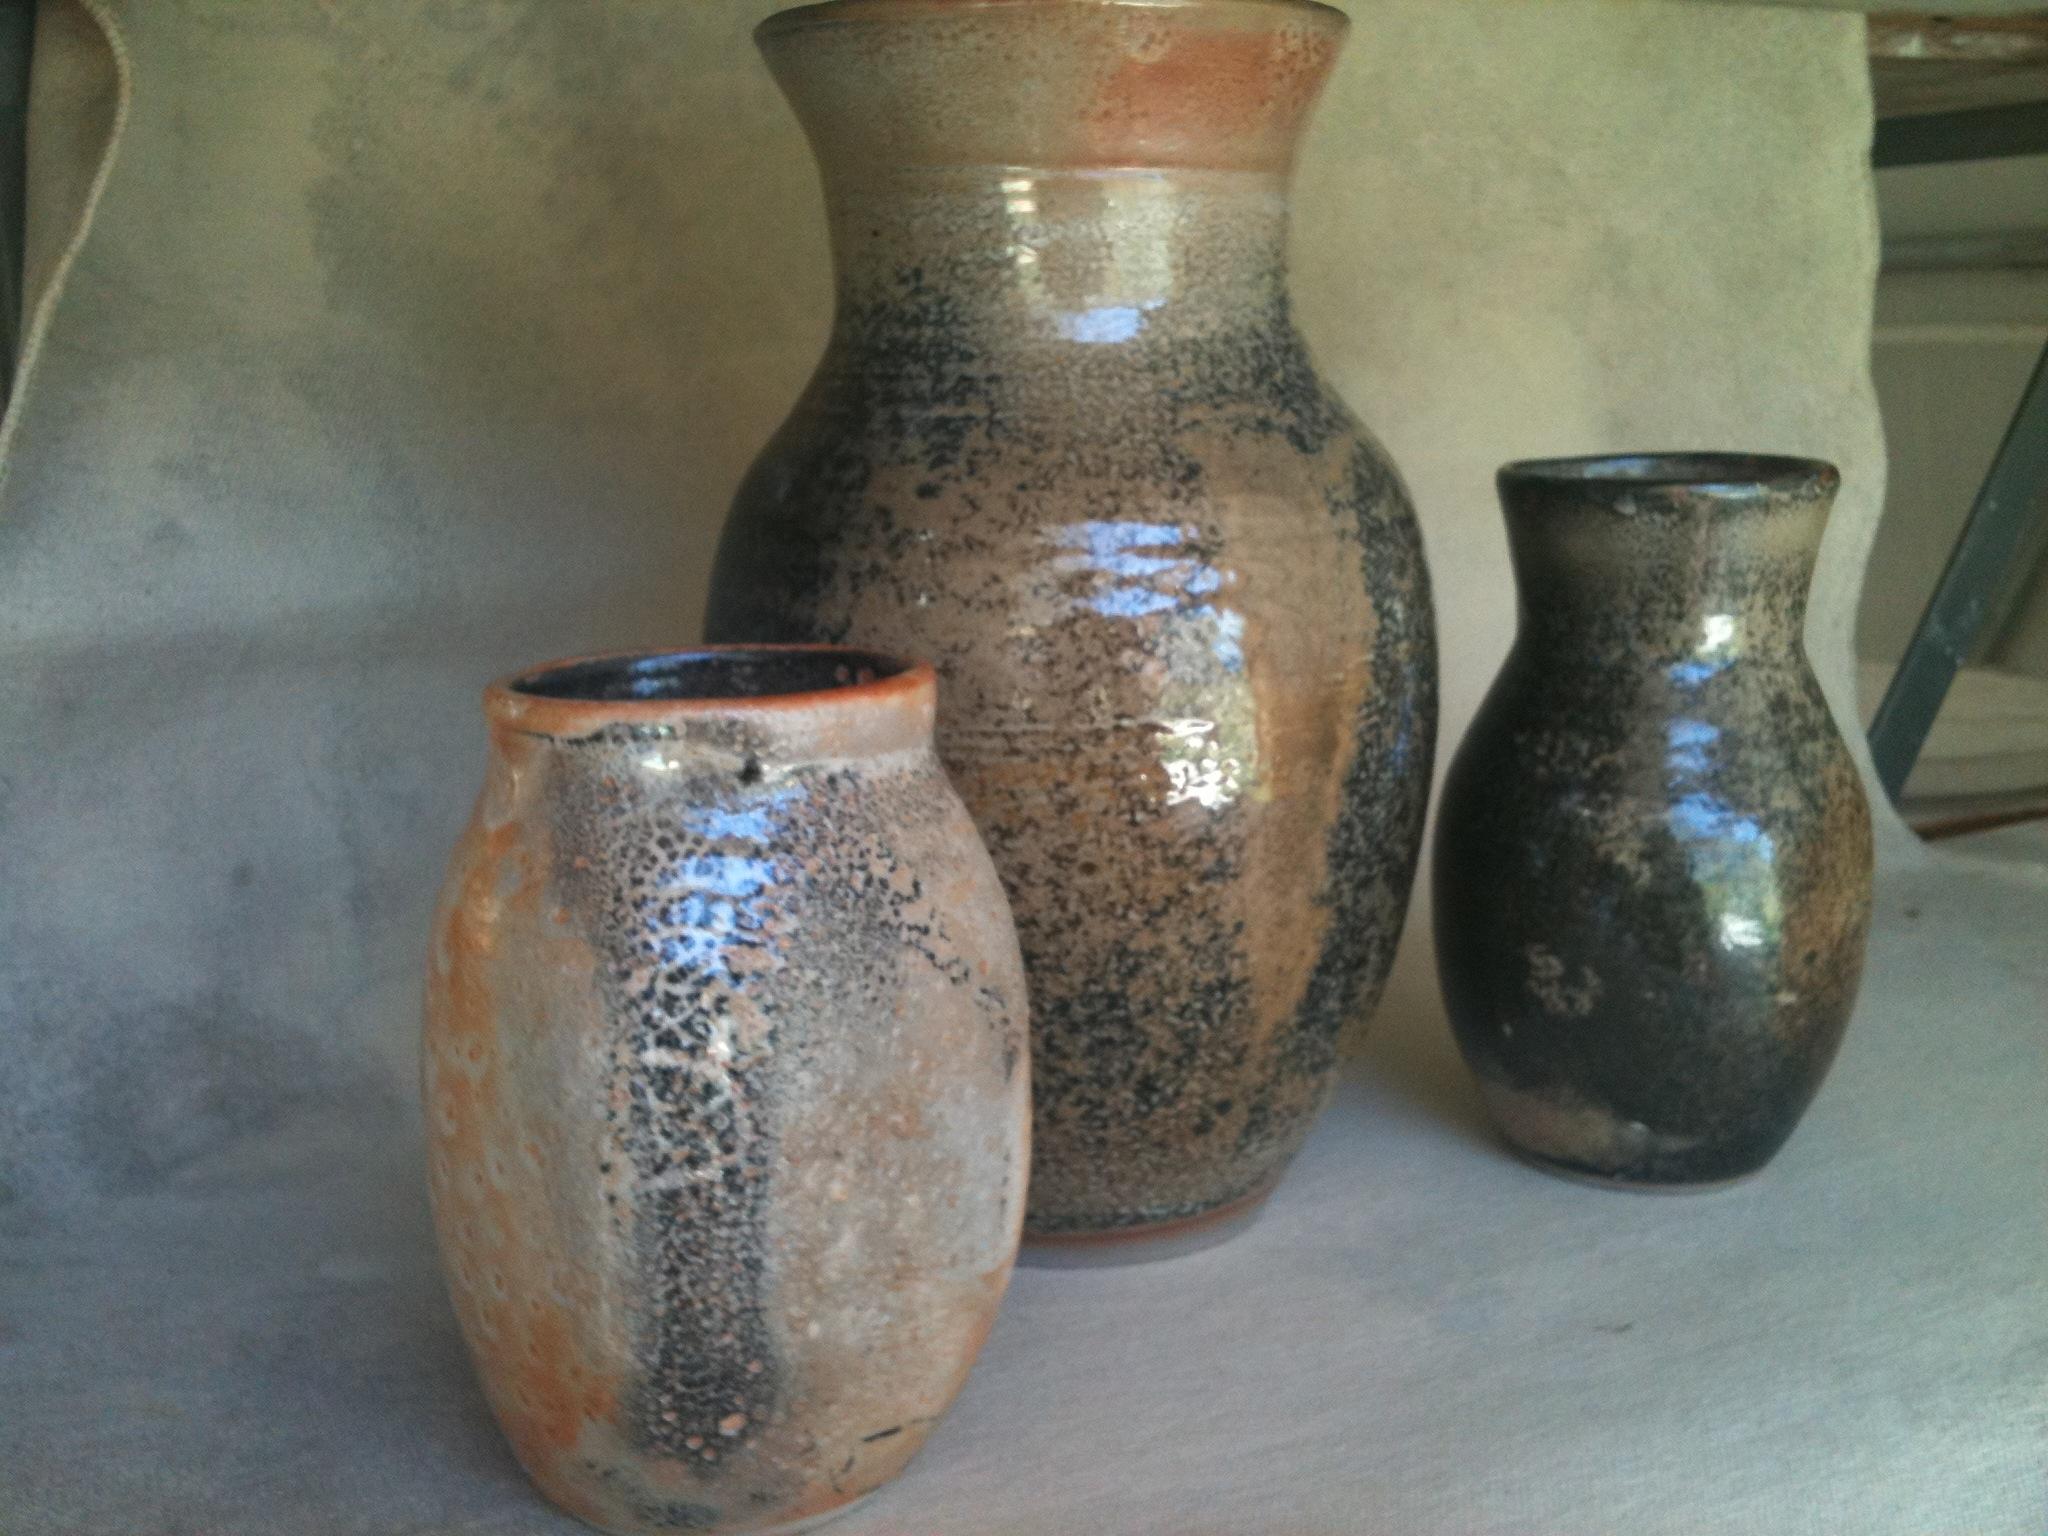 Carbon trap shino vases